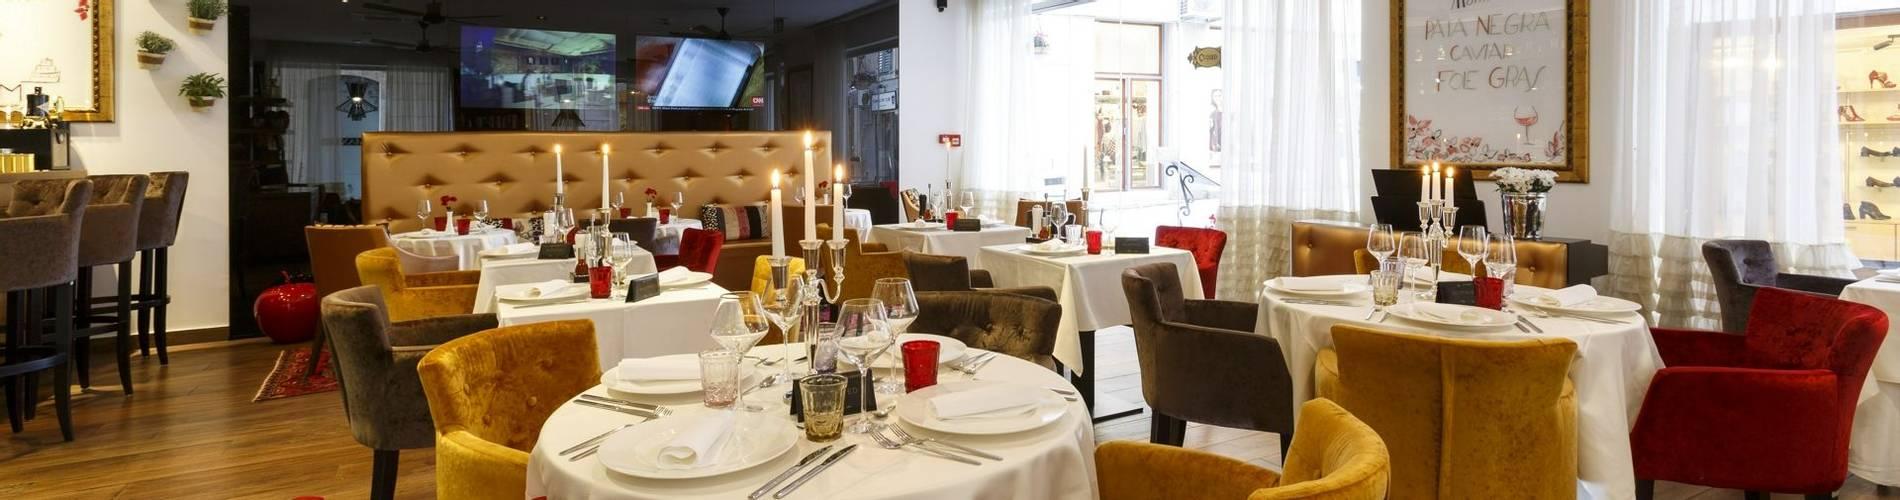 Restaurant-Heritage-Marmont-Completely-Croatia.jpg